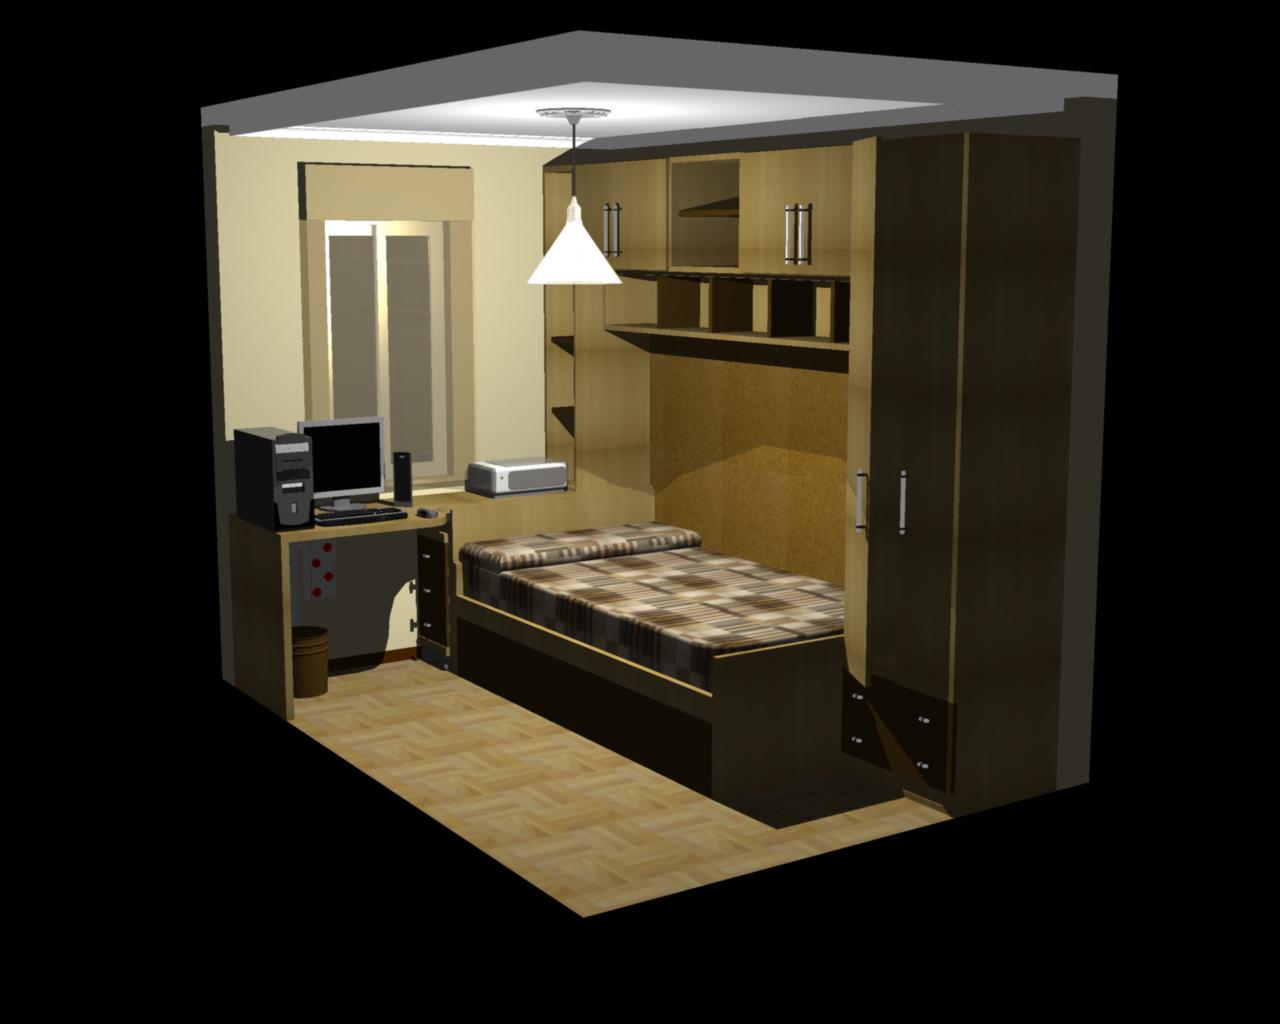 Habitacion 3d by jvalle on deviantart for Planificador habitacion 3d